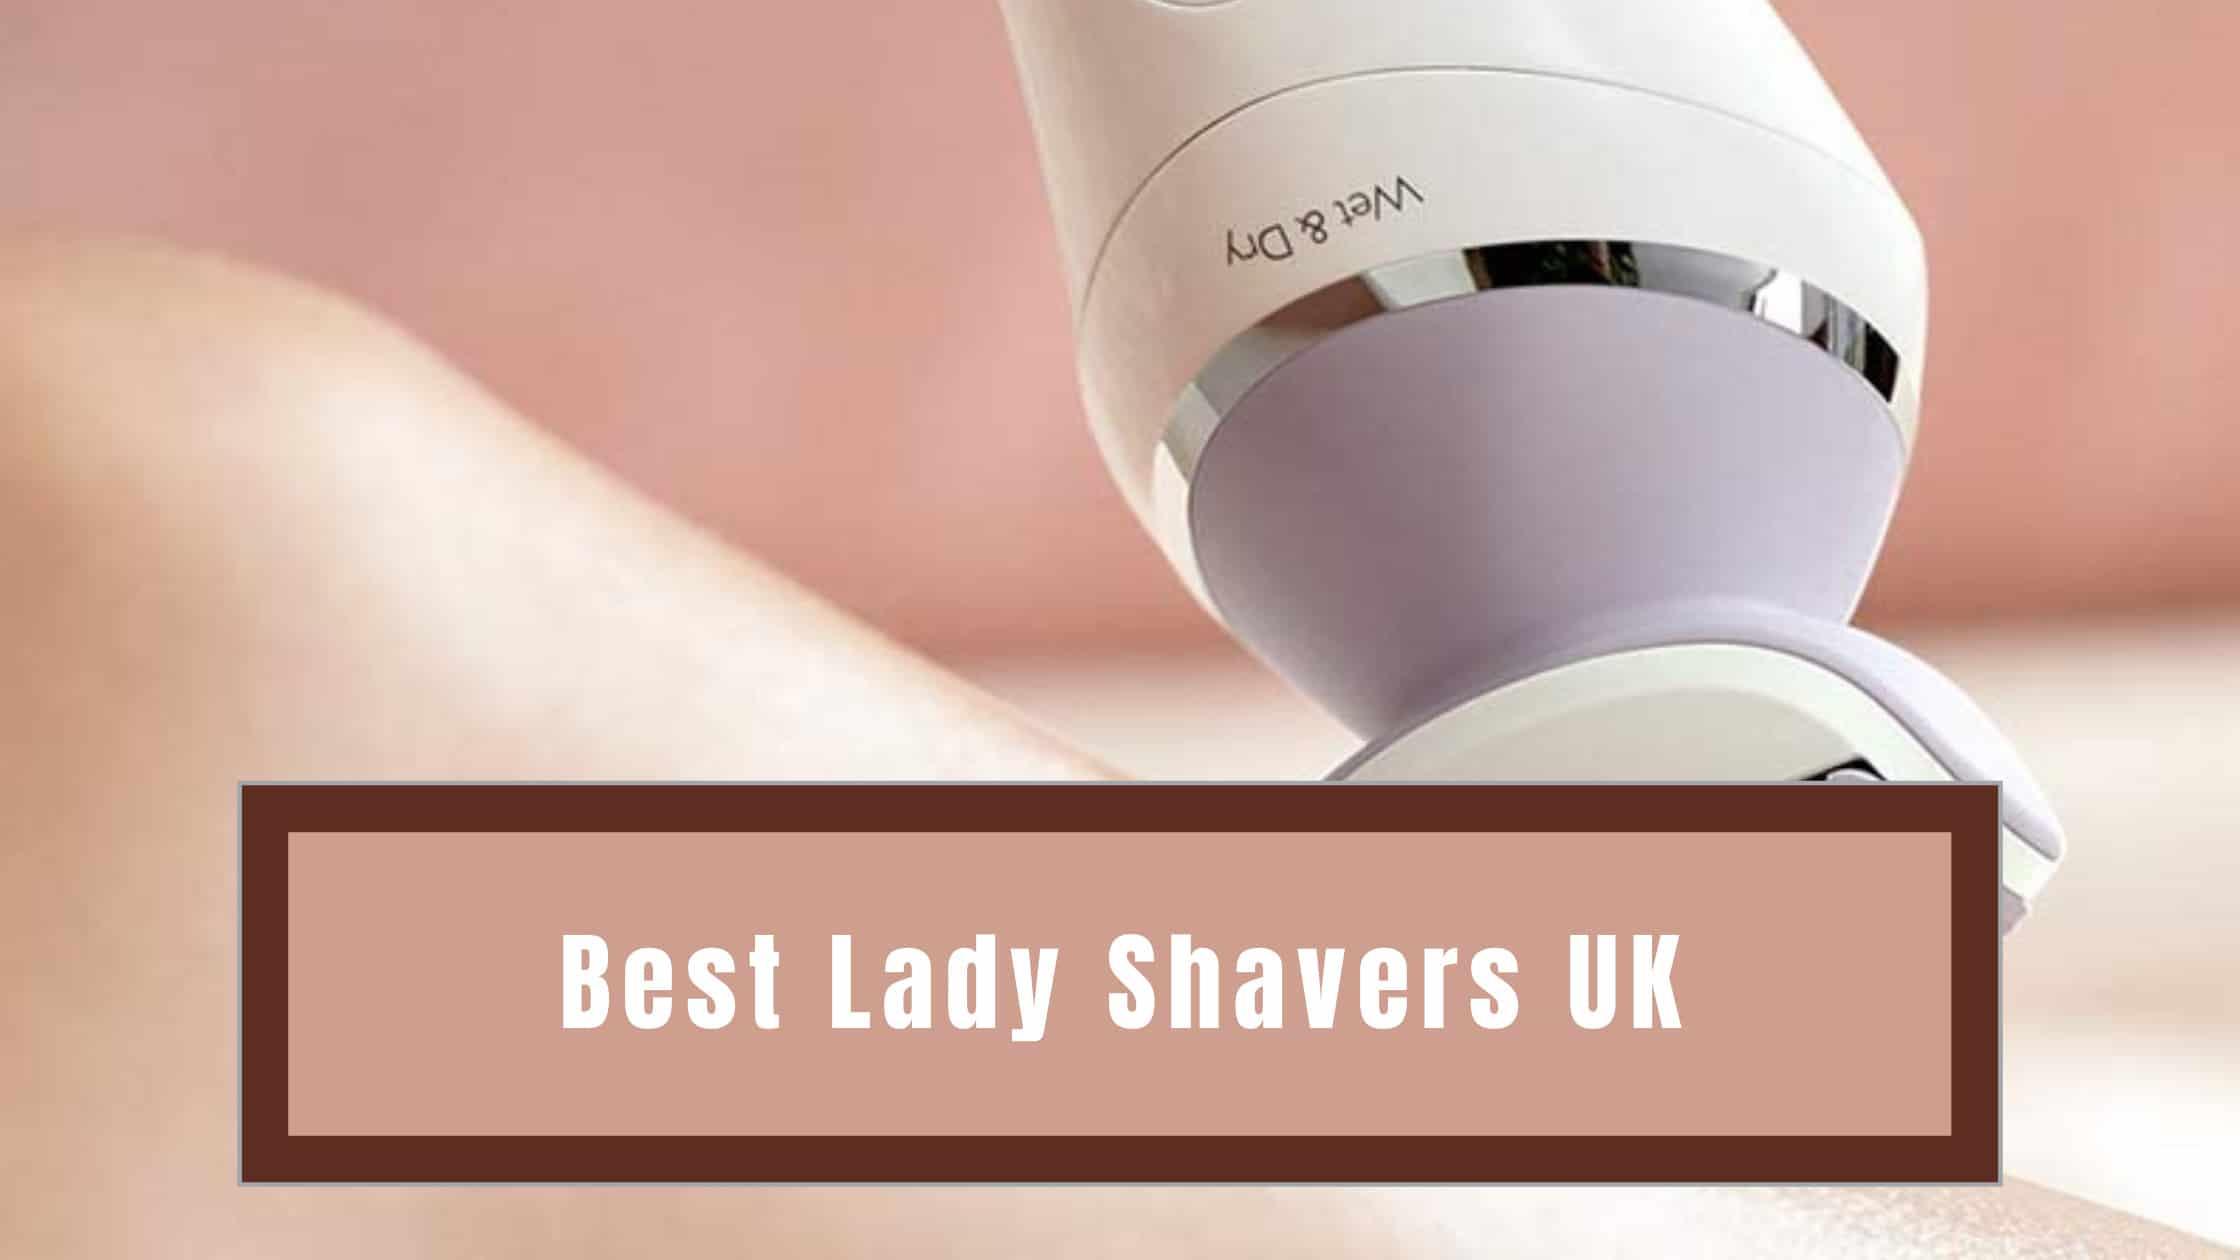 Best Lady Shavers UK